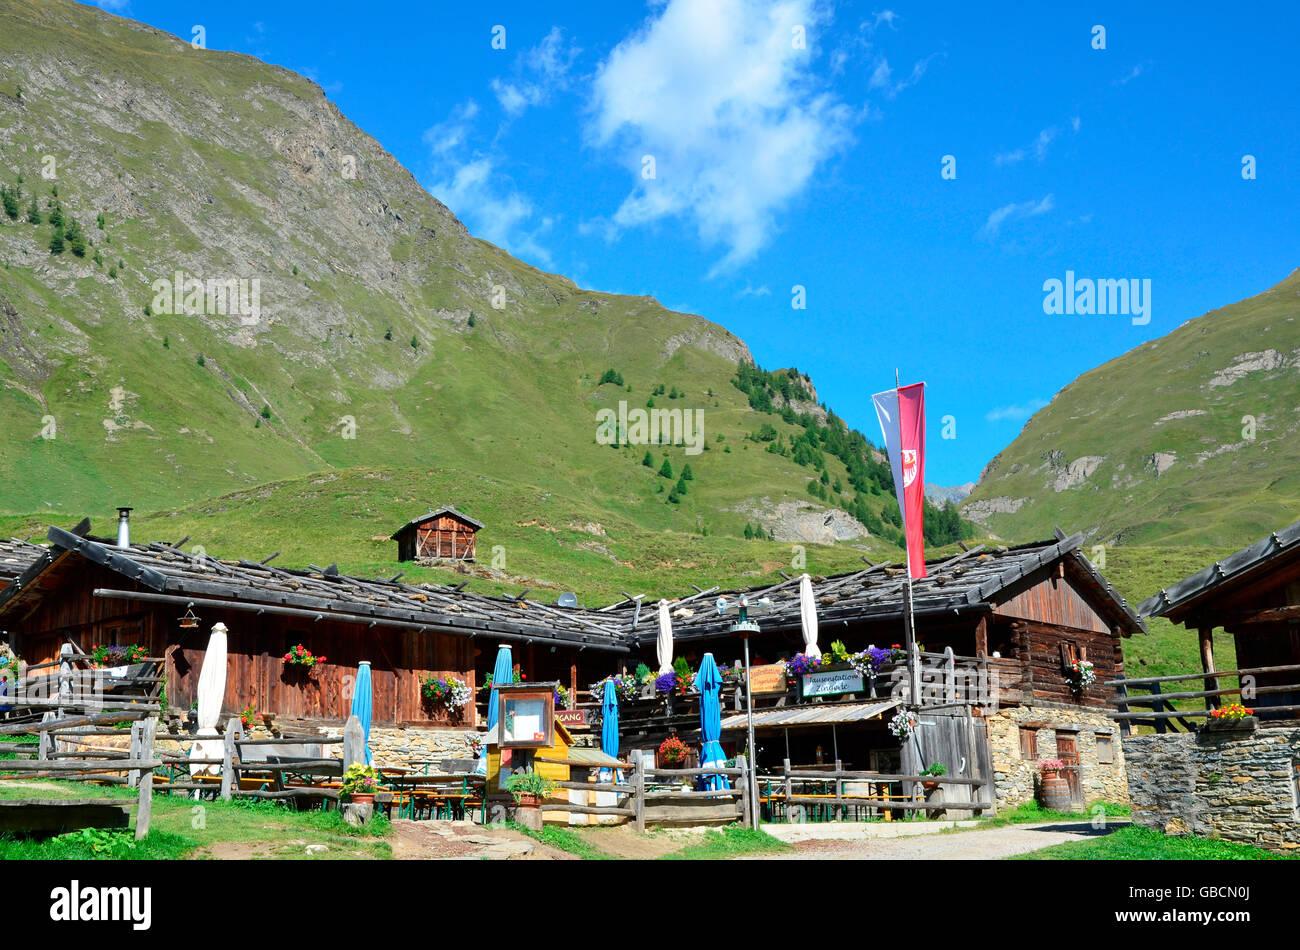 Landidylle, Sommer, Almhuette, Alm, Almdorf, Fane Alm, Pustertal, Suedtirol, Italien Stock Photo